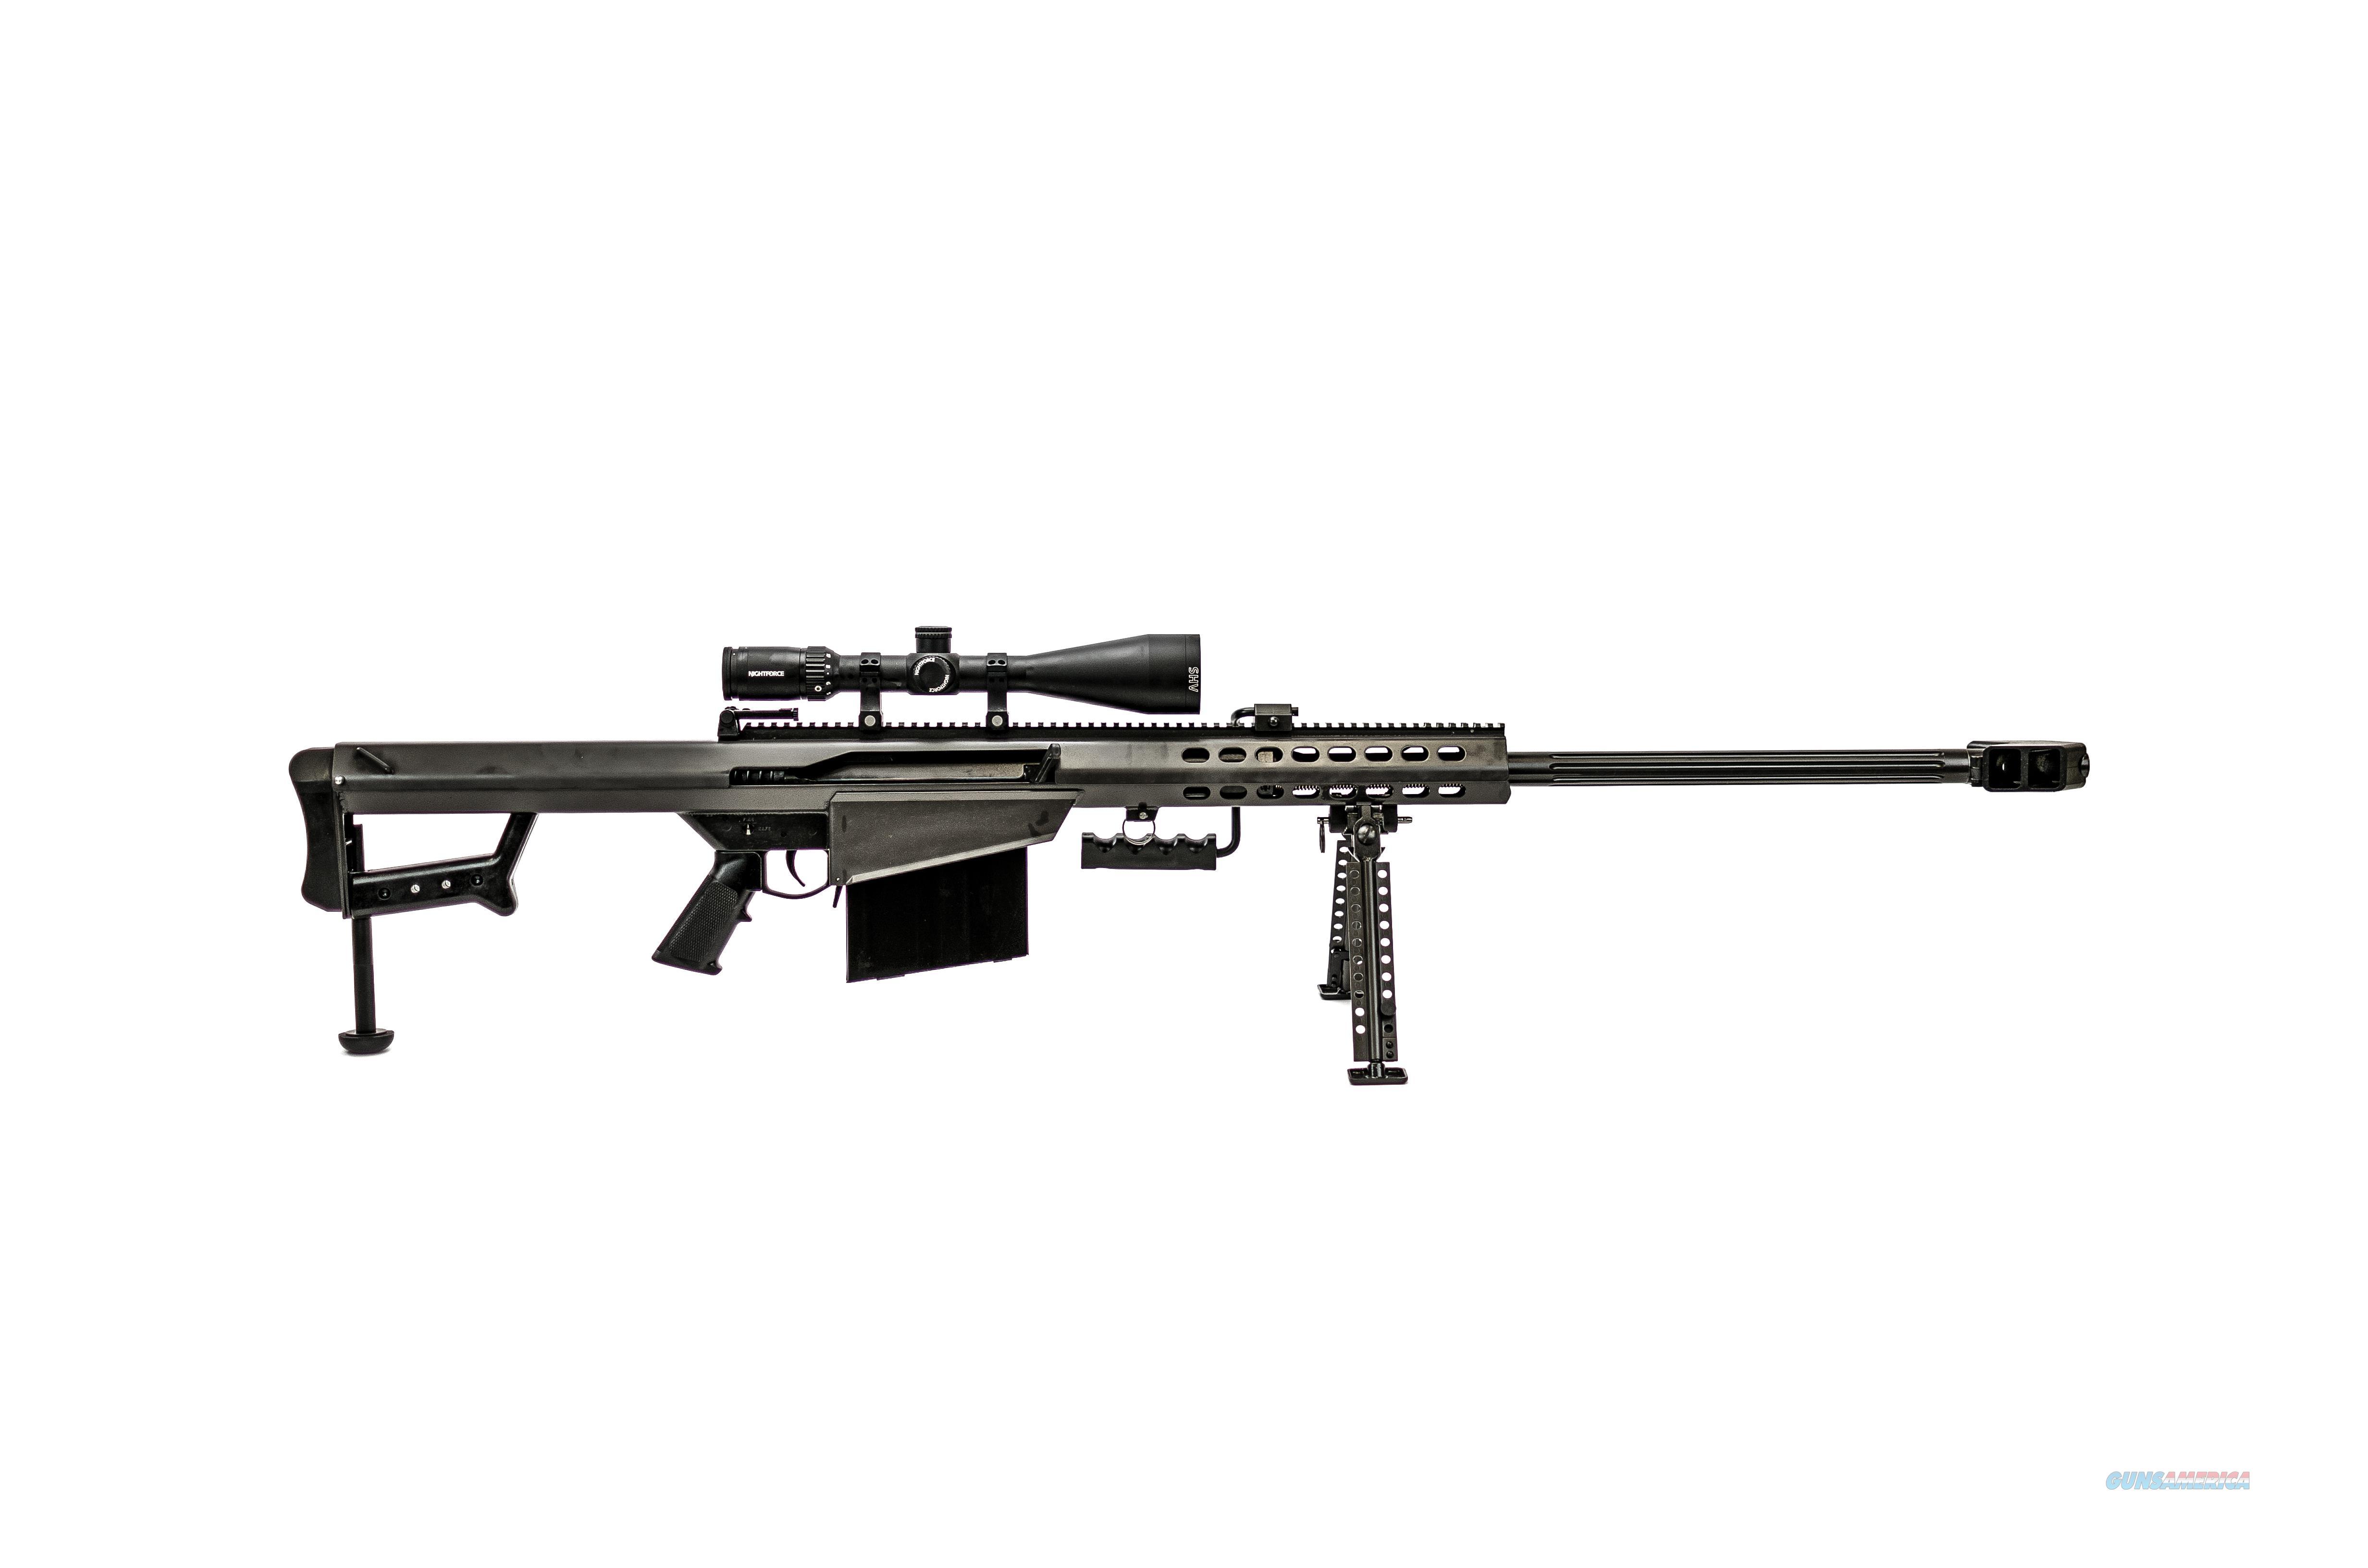 Barrett Firearms 82A1 50BMG BLK 29 SCOPE COMBO 5-20X56 NIGHTFORCE SCOPE  Guns > Rifles > B Misc Rifles